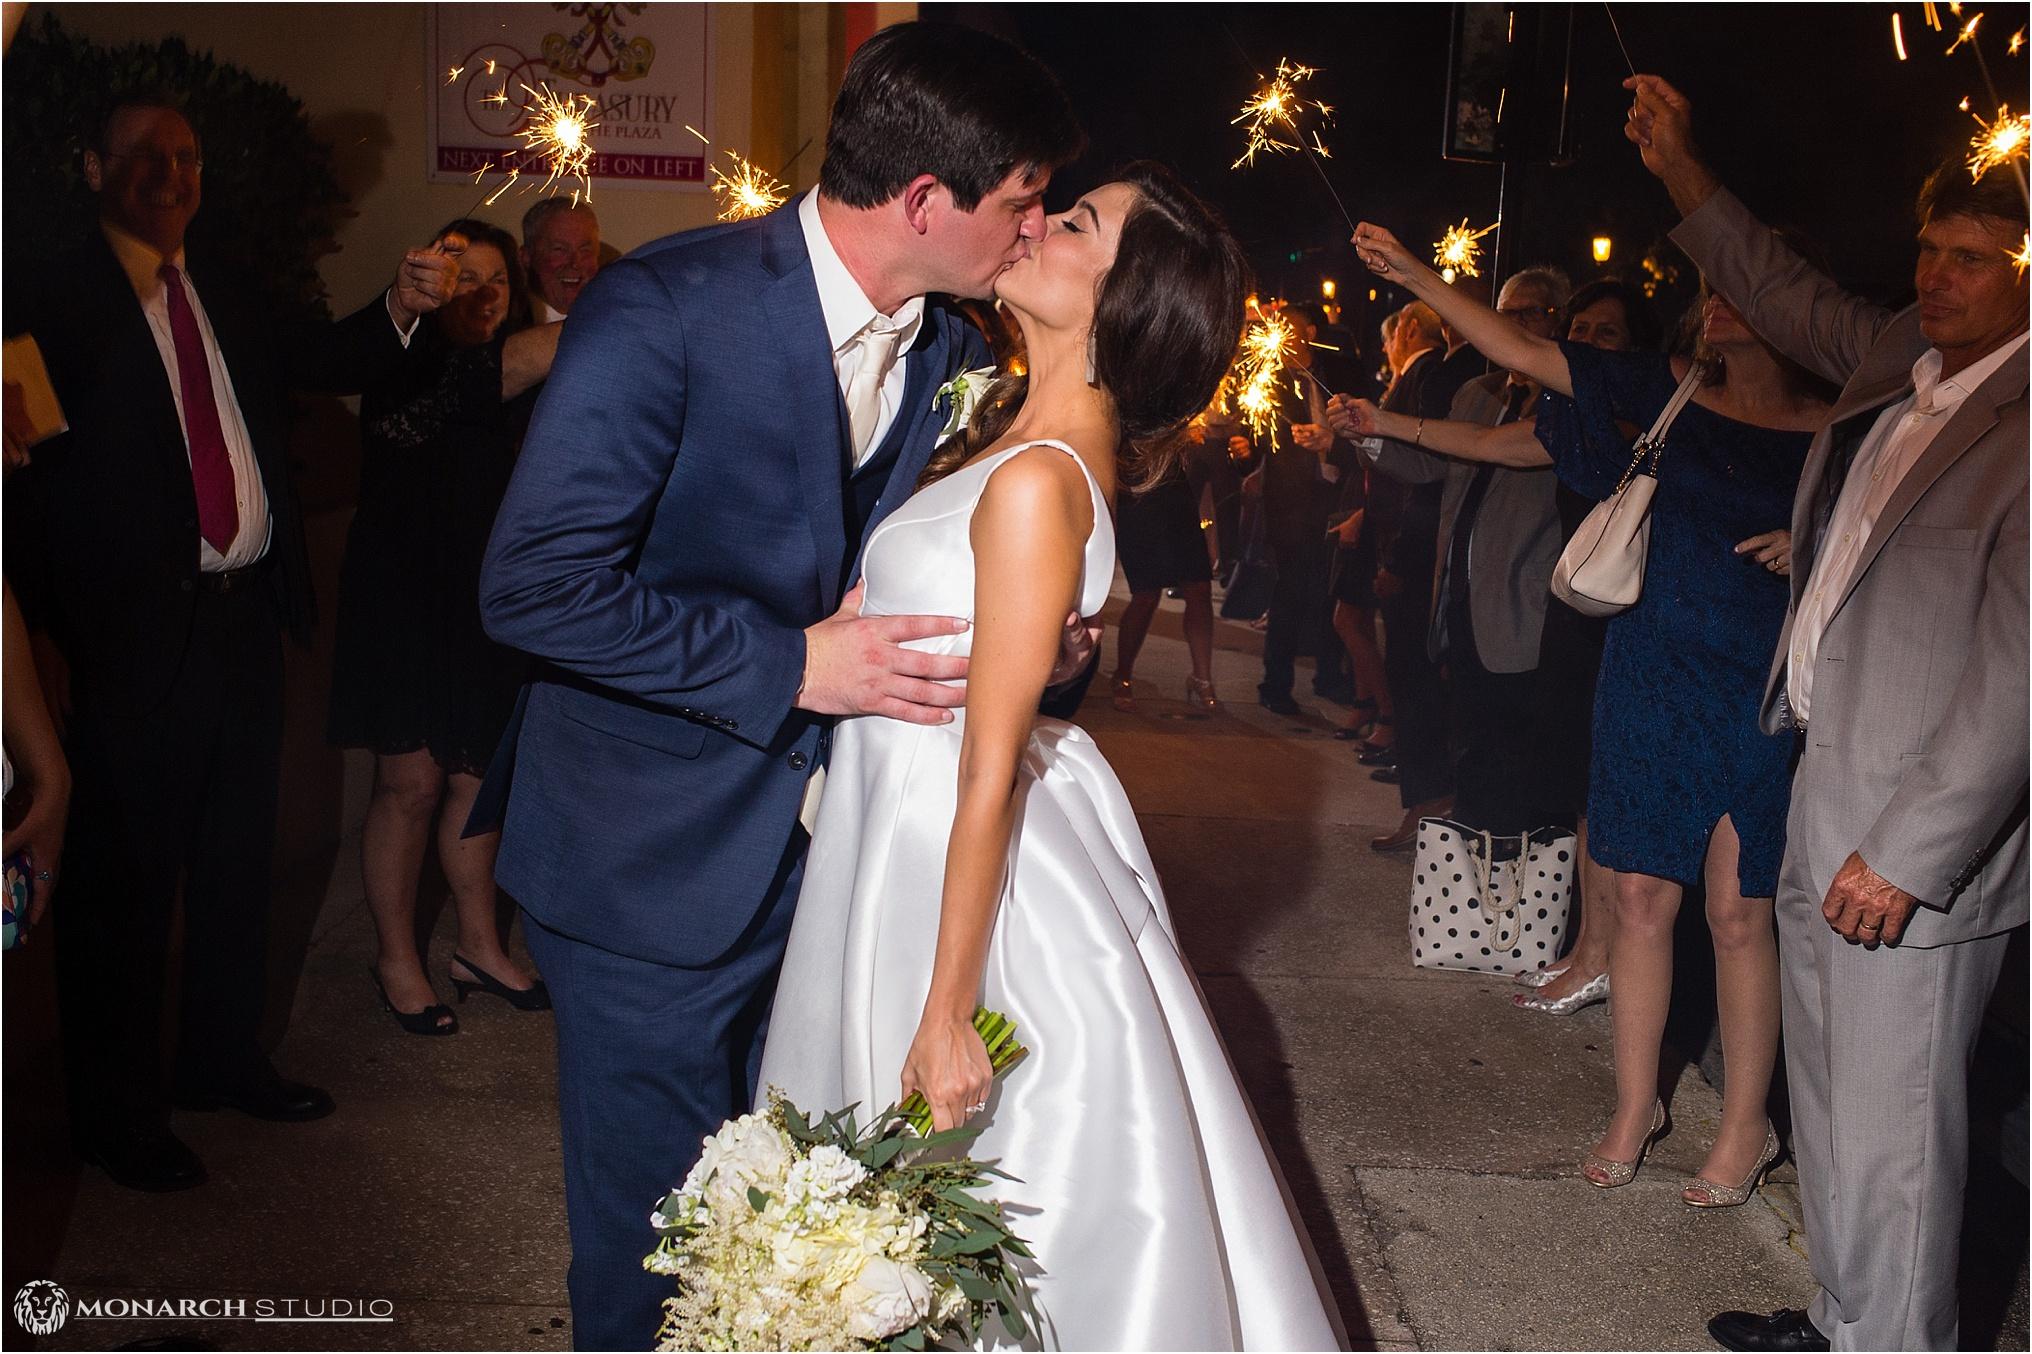 st-augustine-wedding-photographer-156.jpg